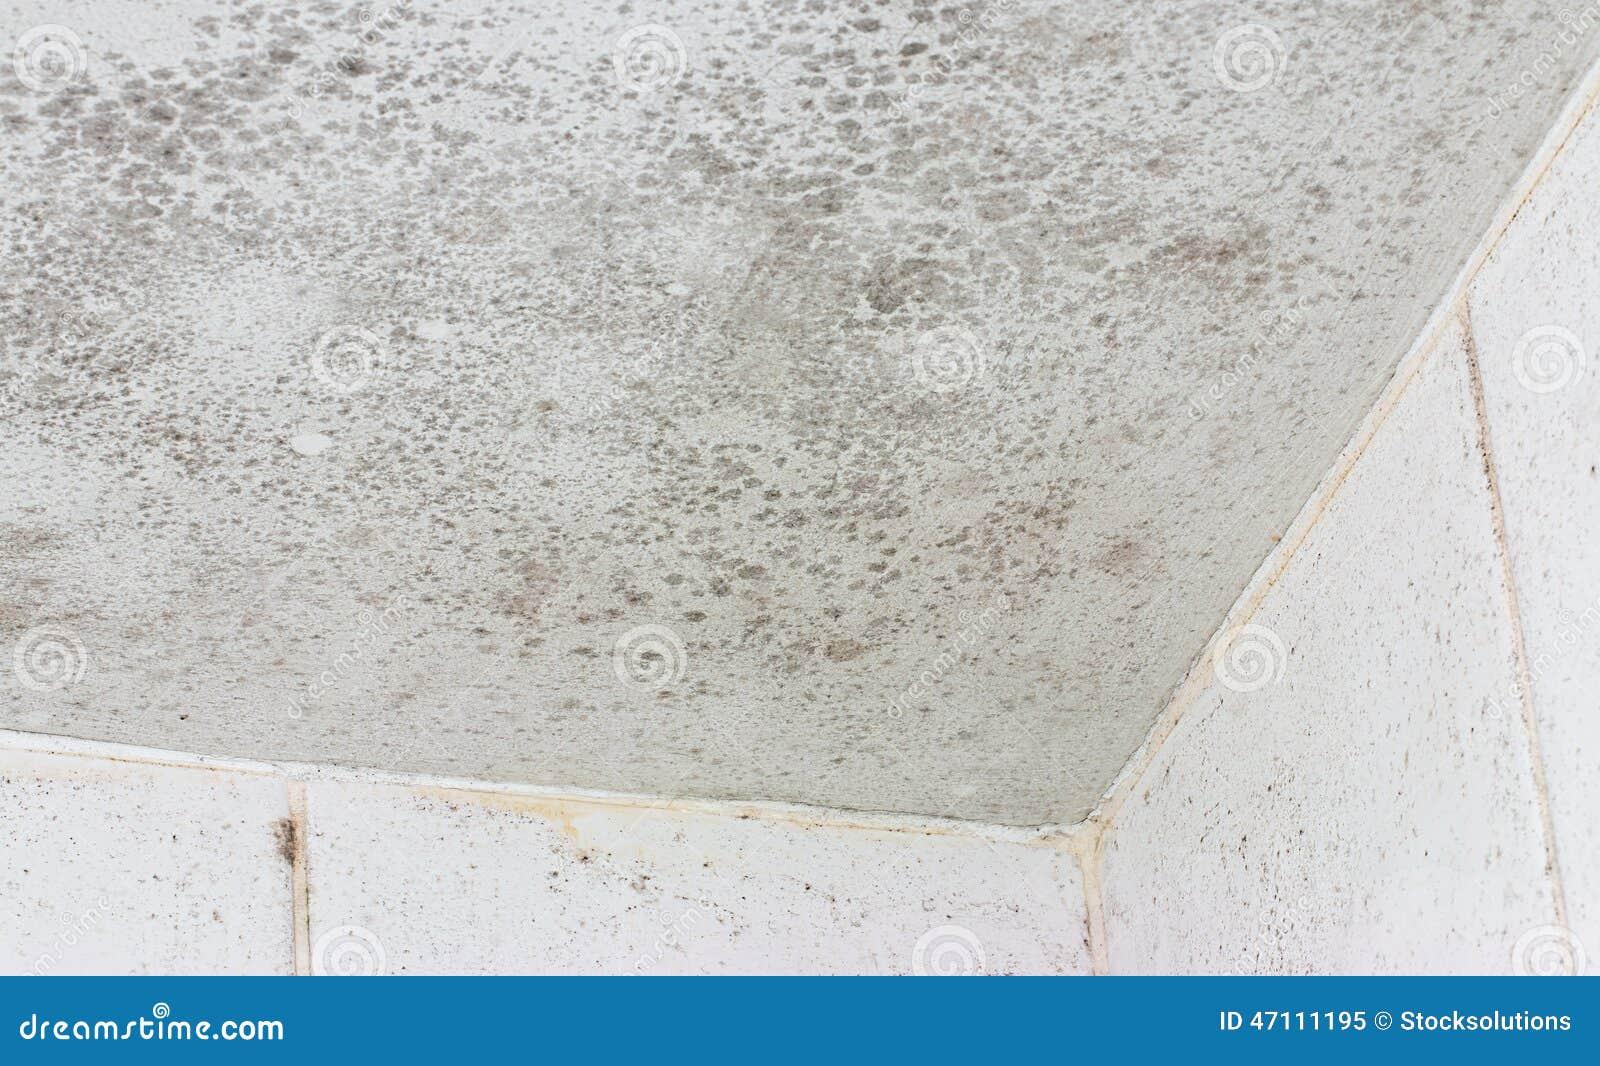 Ceiling Mould Mildew Stock Image Image Of Allergy Improvement - Mildew on bathroom ceiling